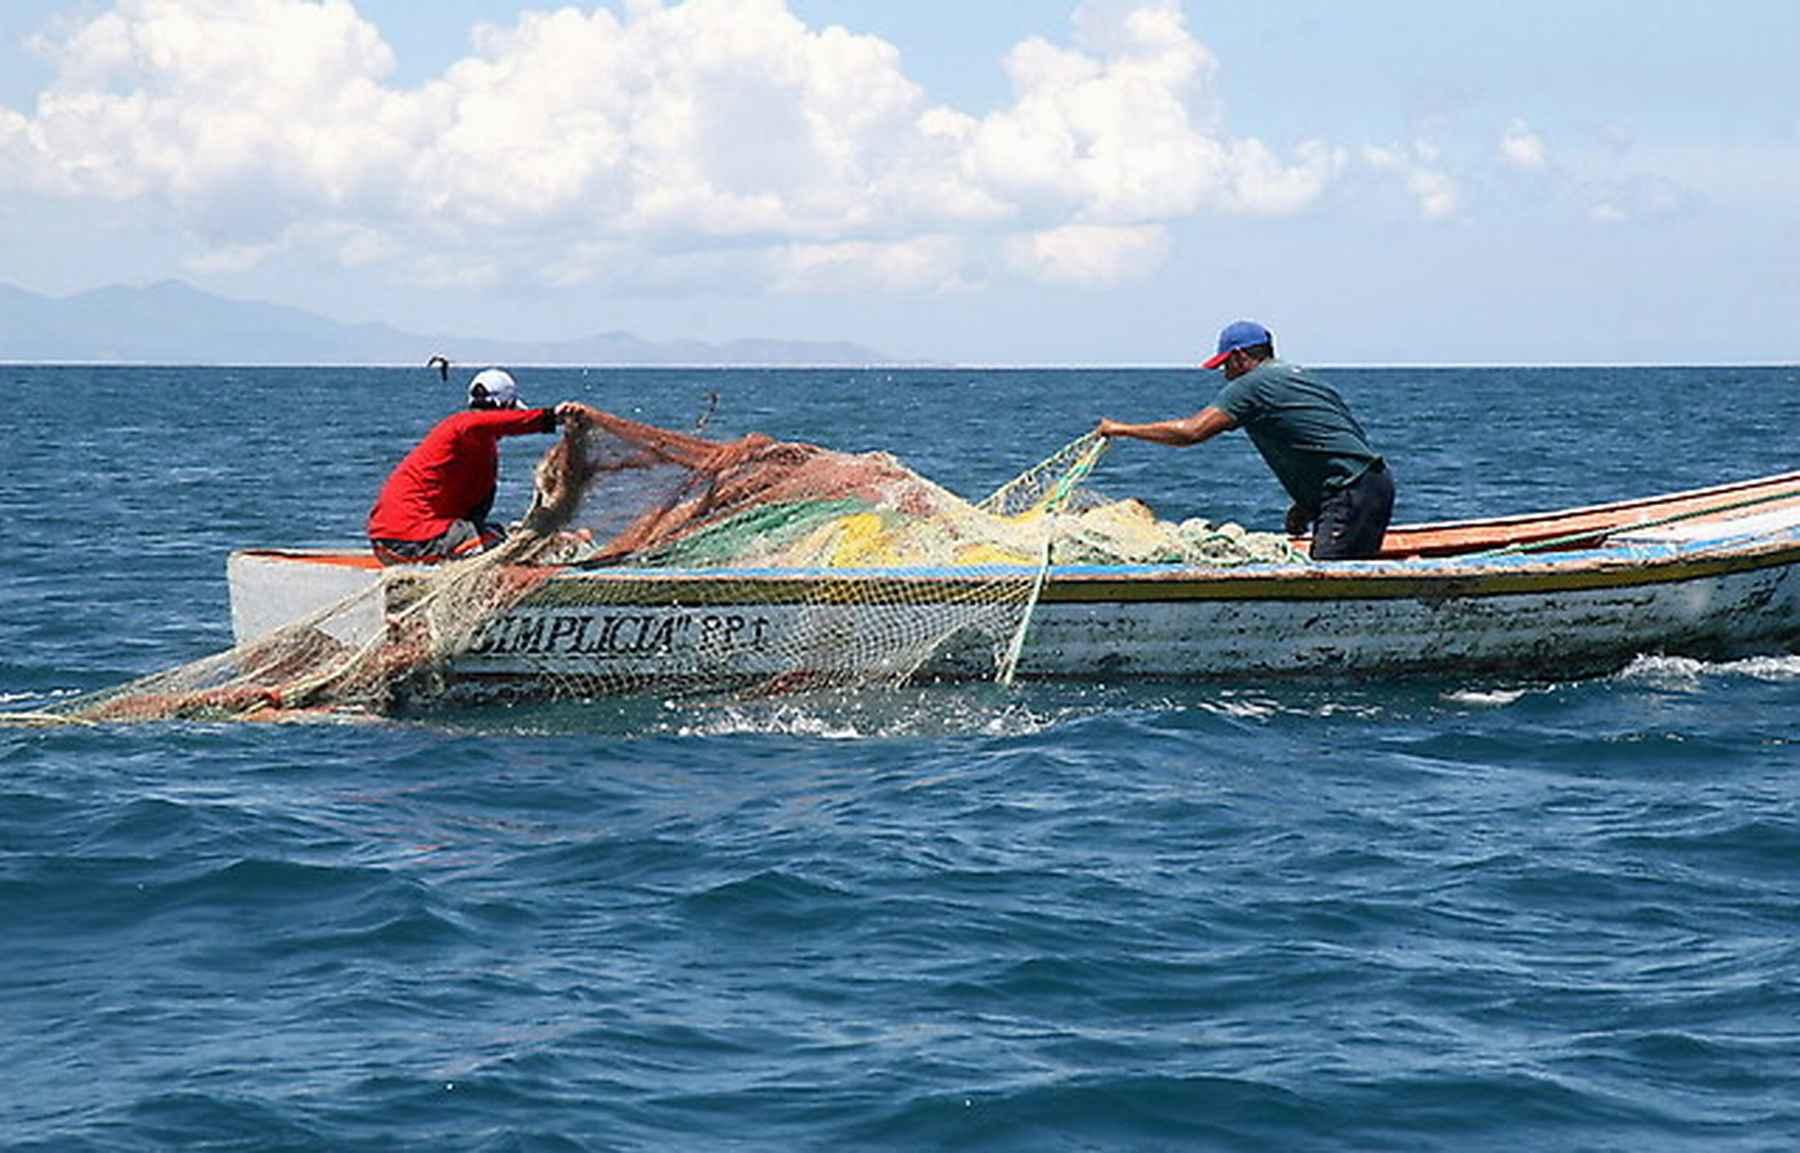 INCOPESCA: Falta infraestructura para pescadores artesanales ...